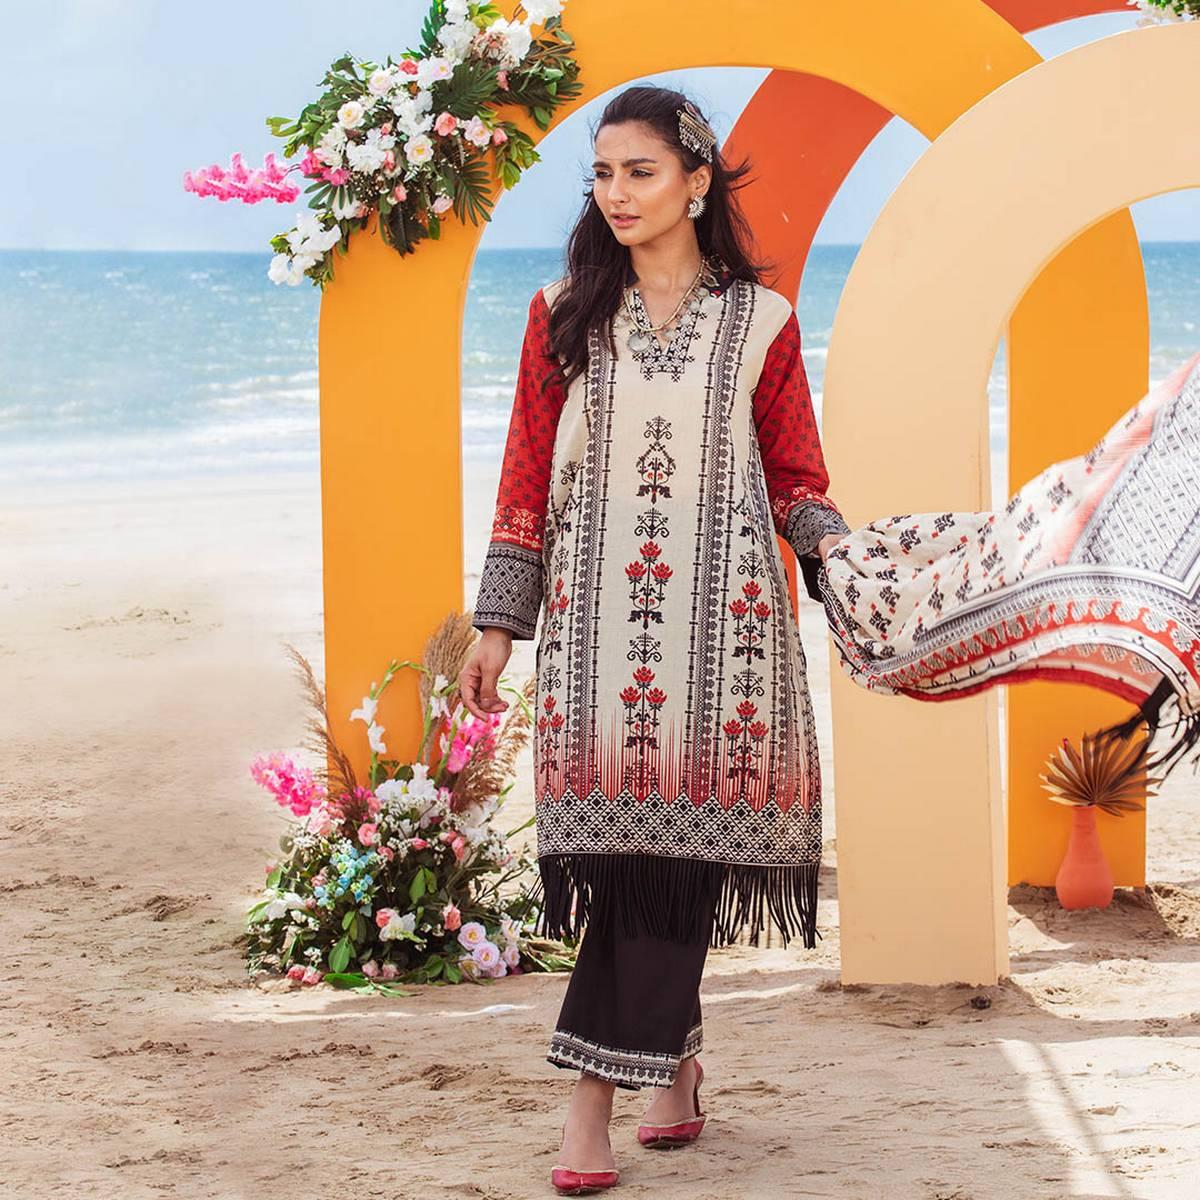 Maahru Tan Garnet - Women's Unstitched 3PC Summer Printed Lawn with Dupatta